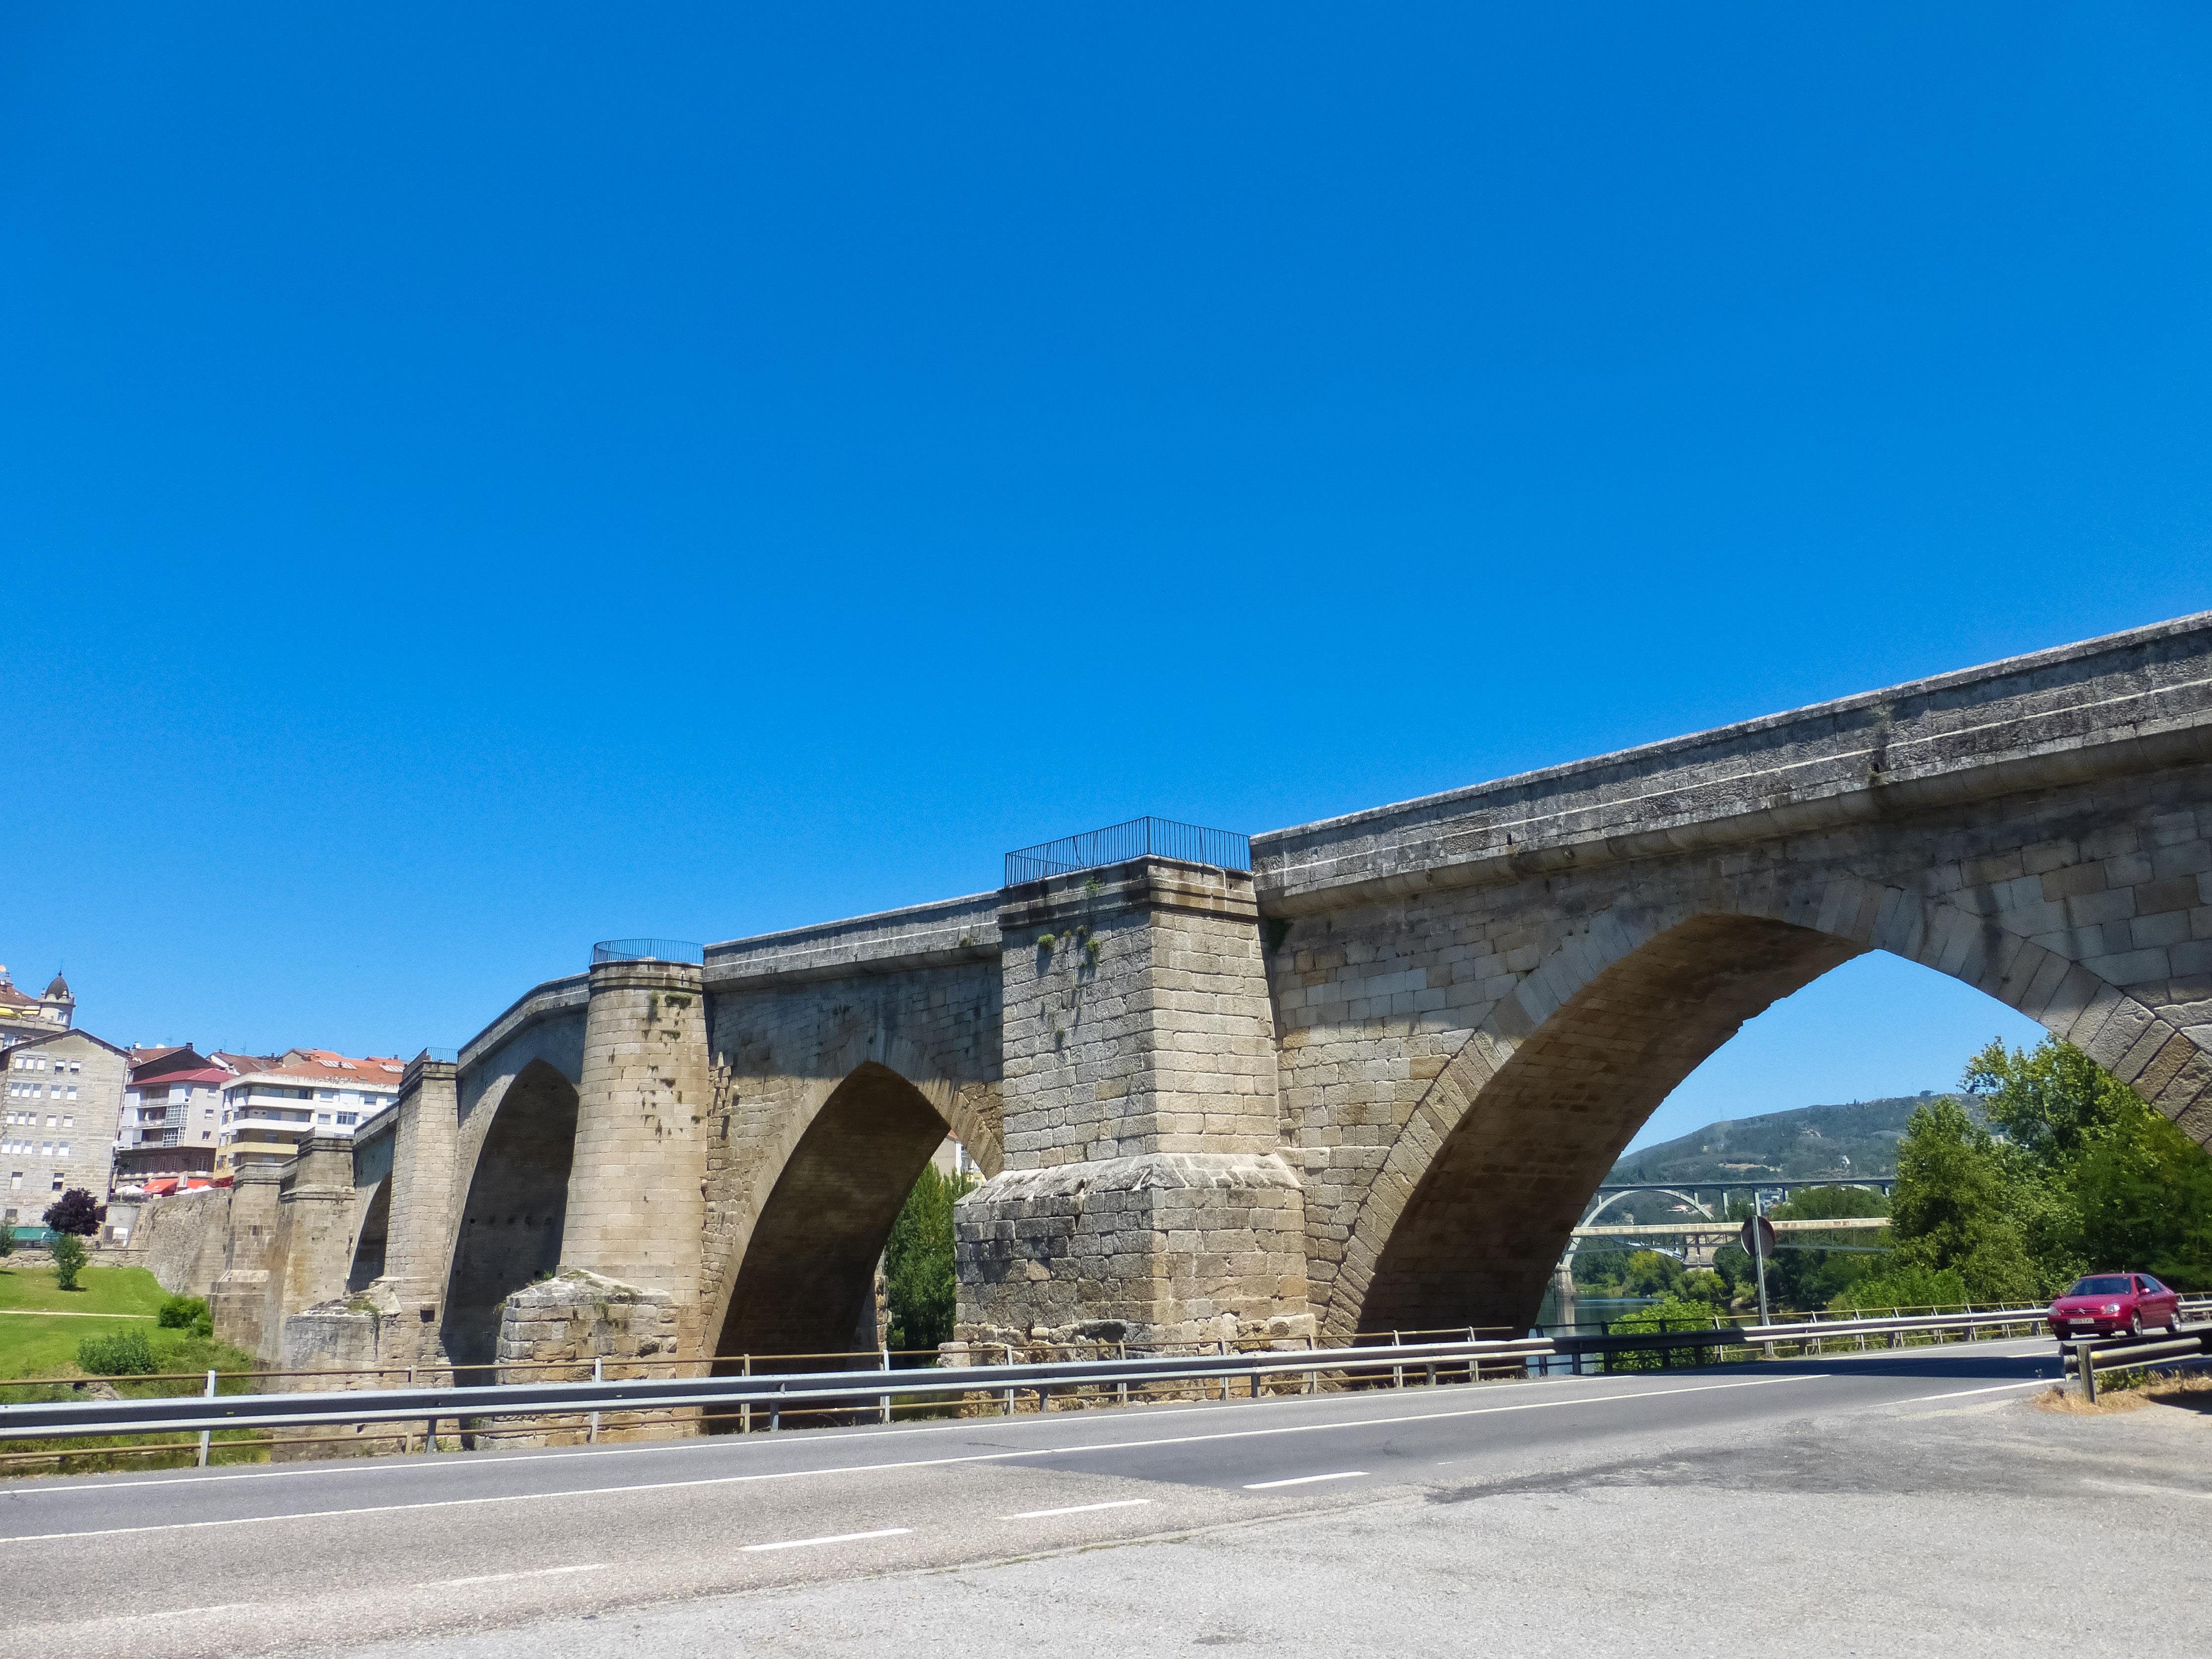 File:Puente Medieval de Orense 1.jpg - Wikimedia Commons